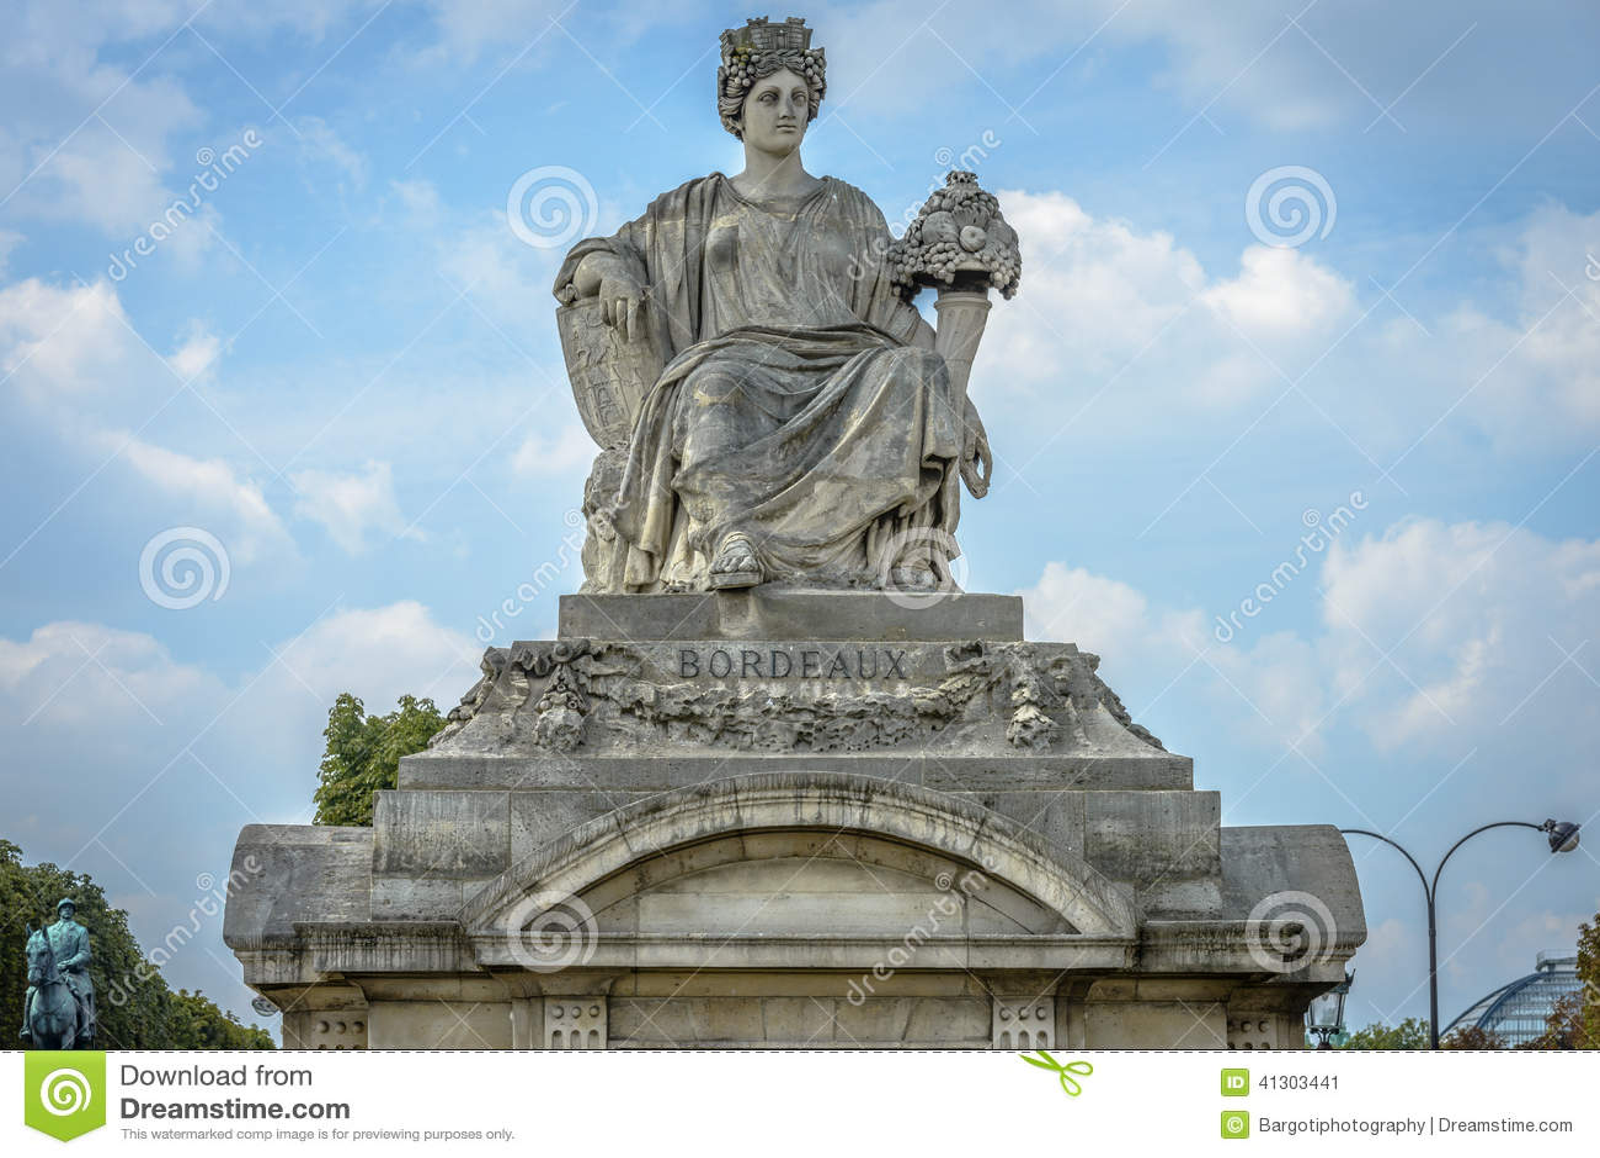 Plaza De La Concordia statue representing bordeaux, place de la concorde, paris